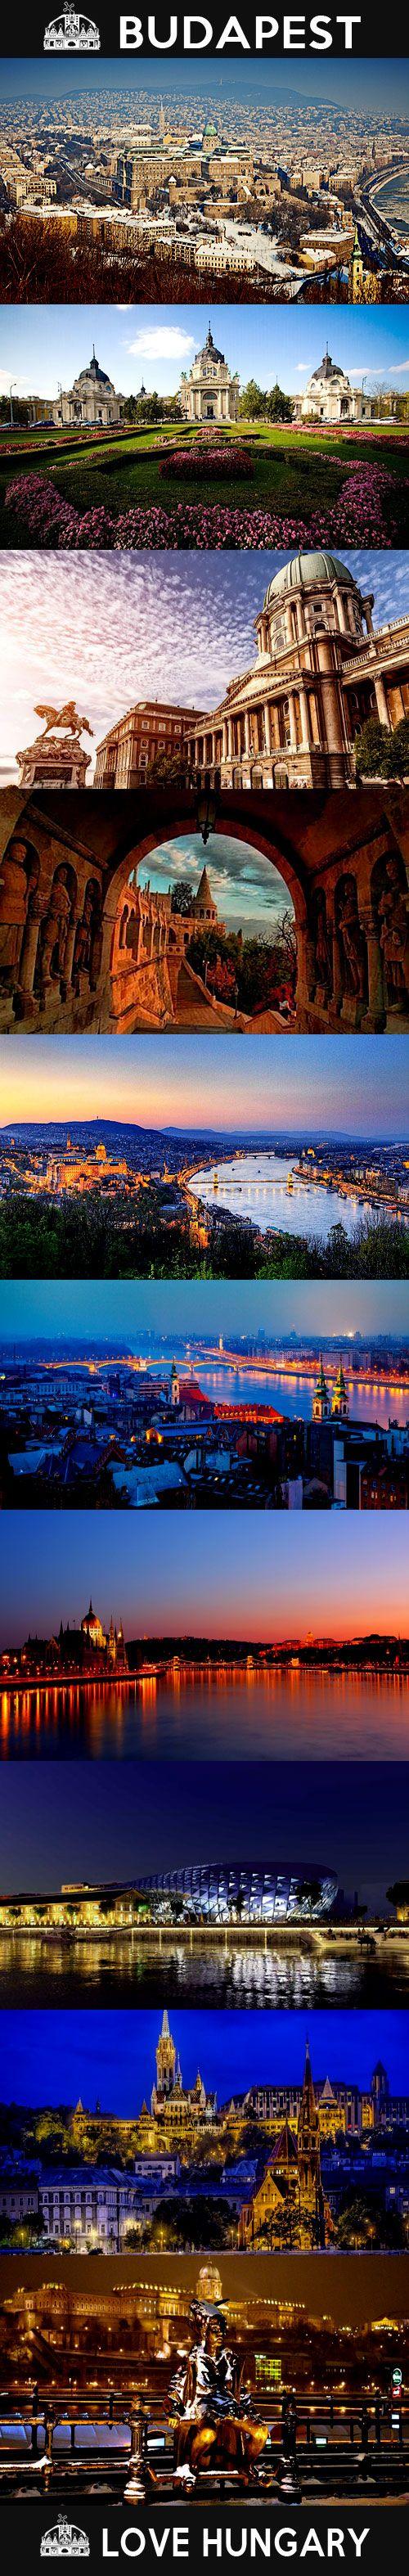 Budapest - Love Hungary! - #Budapest #City #Hungary